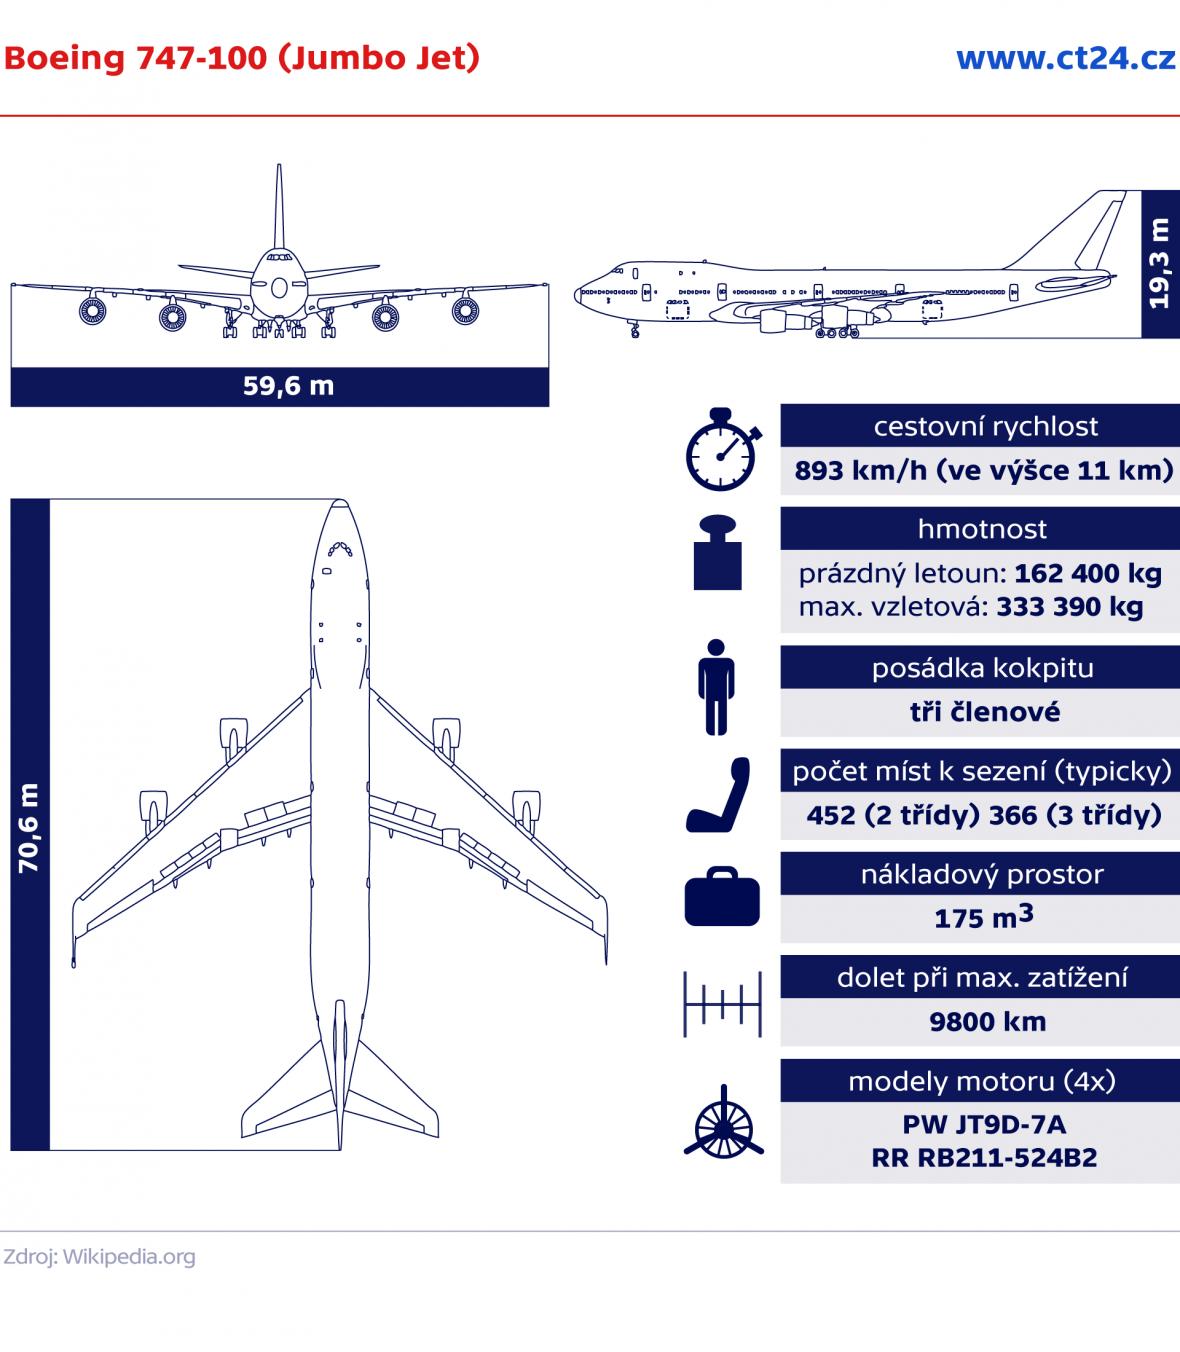 Boeing 747-100 (Jumbo Jet)